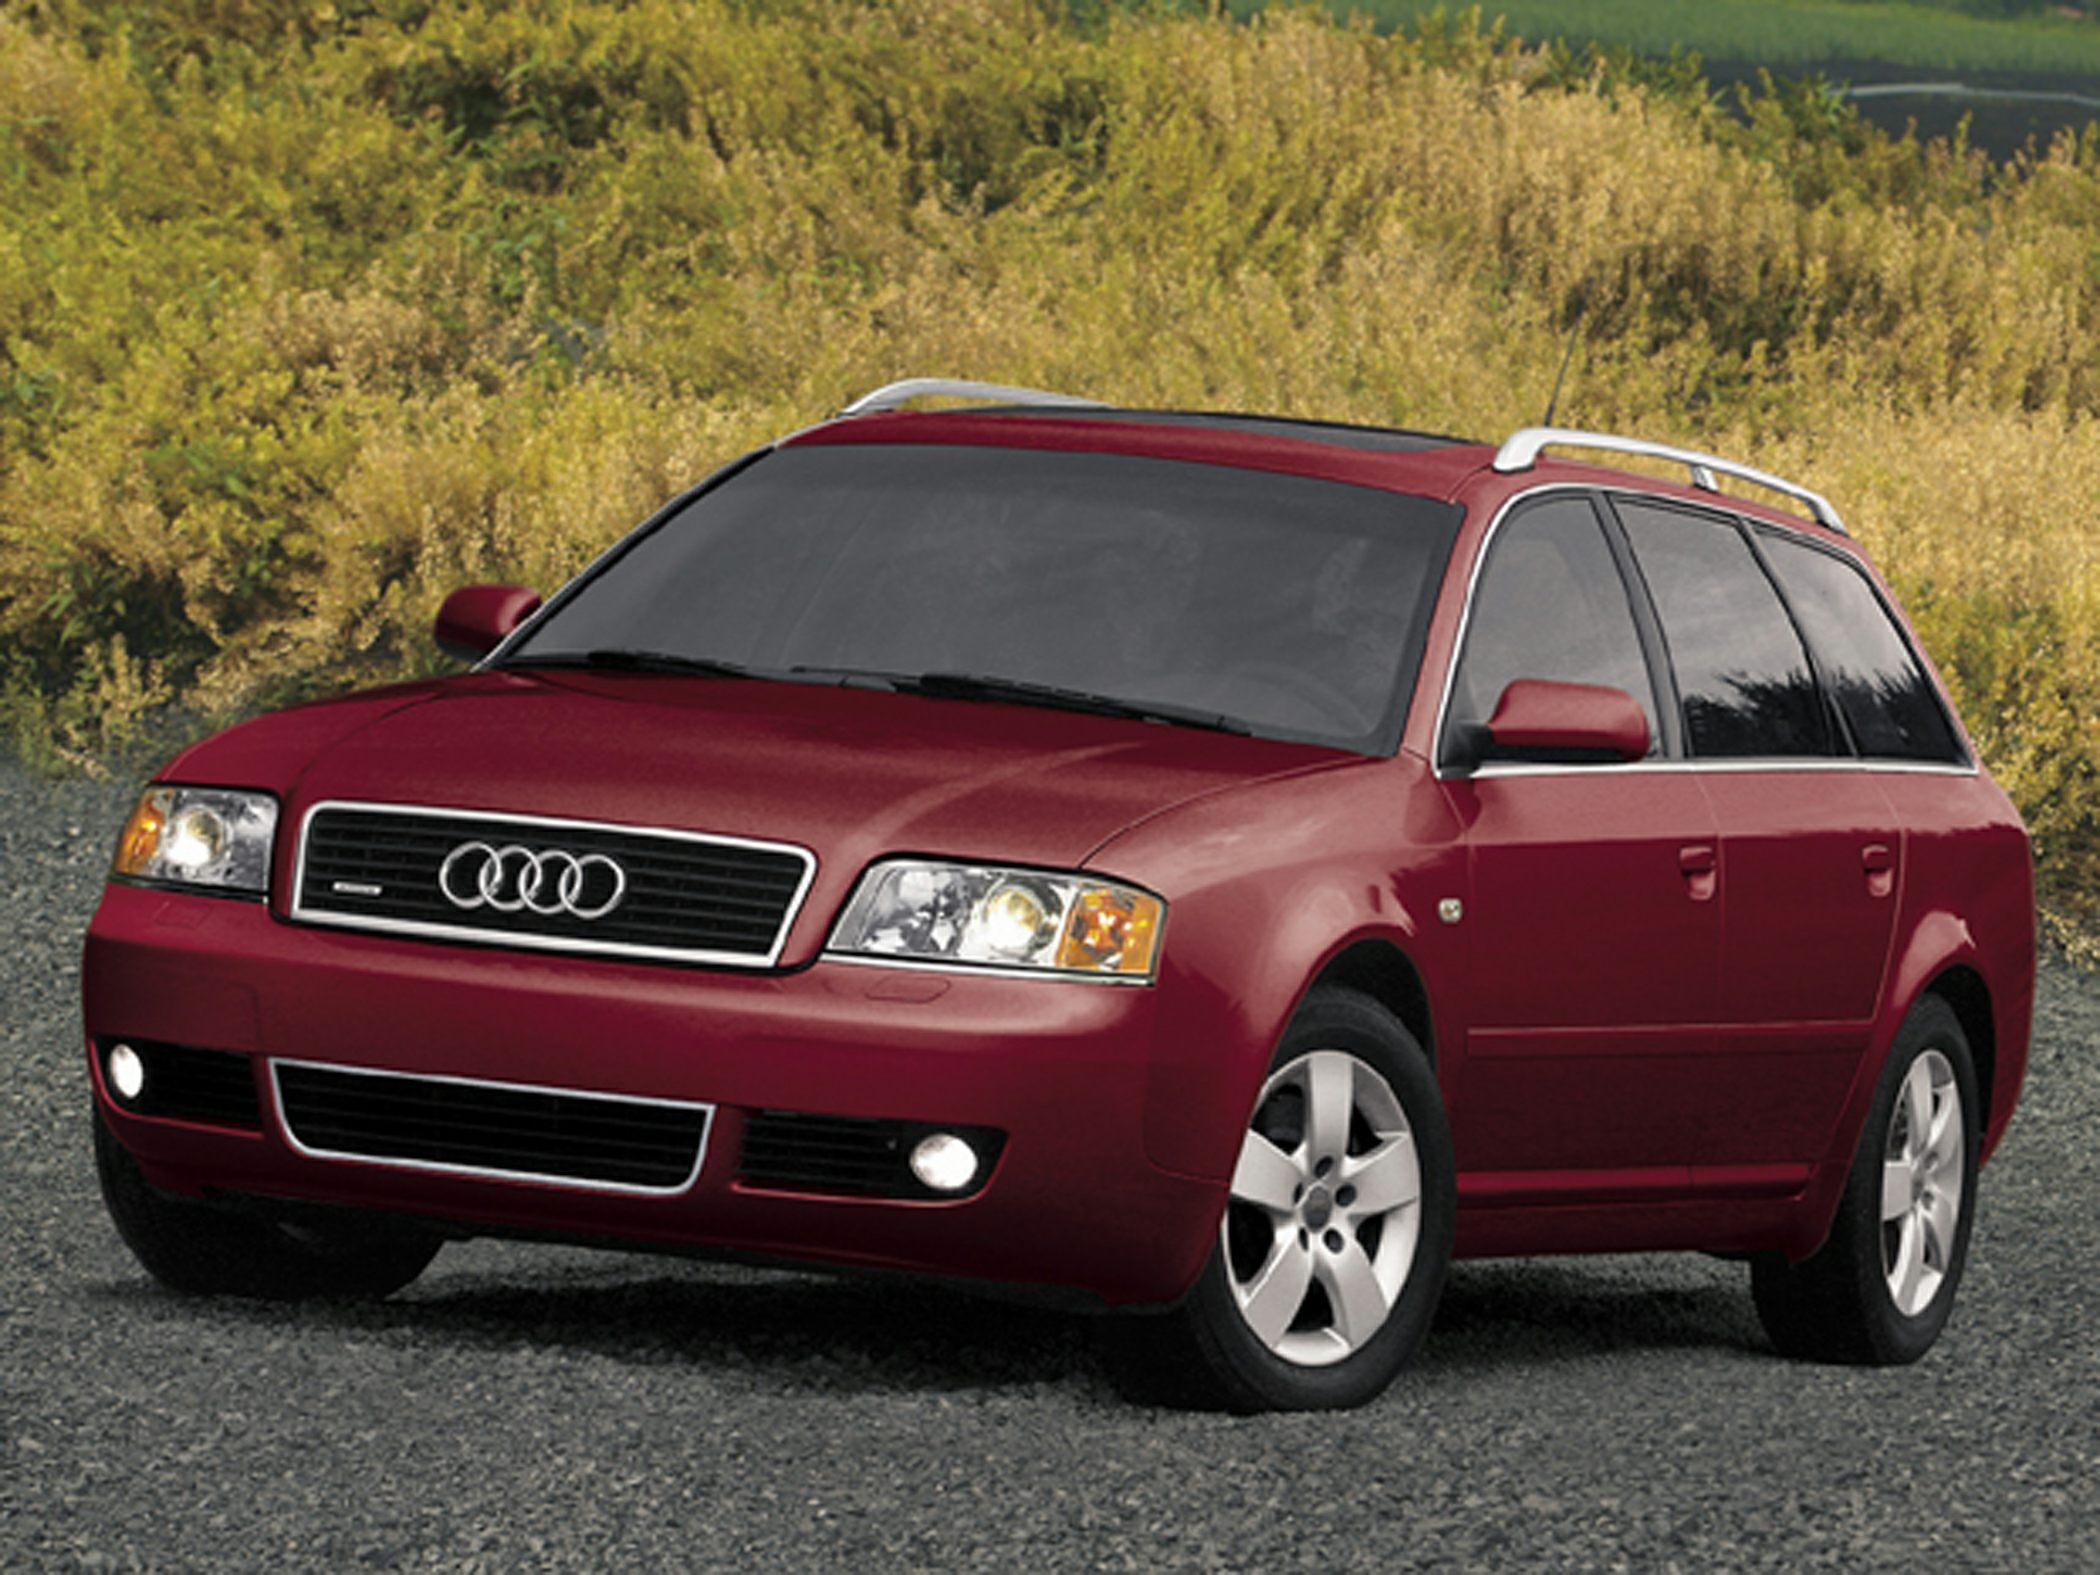 2003 Audi A6 Safety Recalls